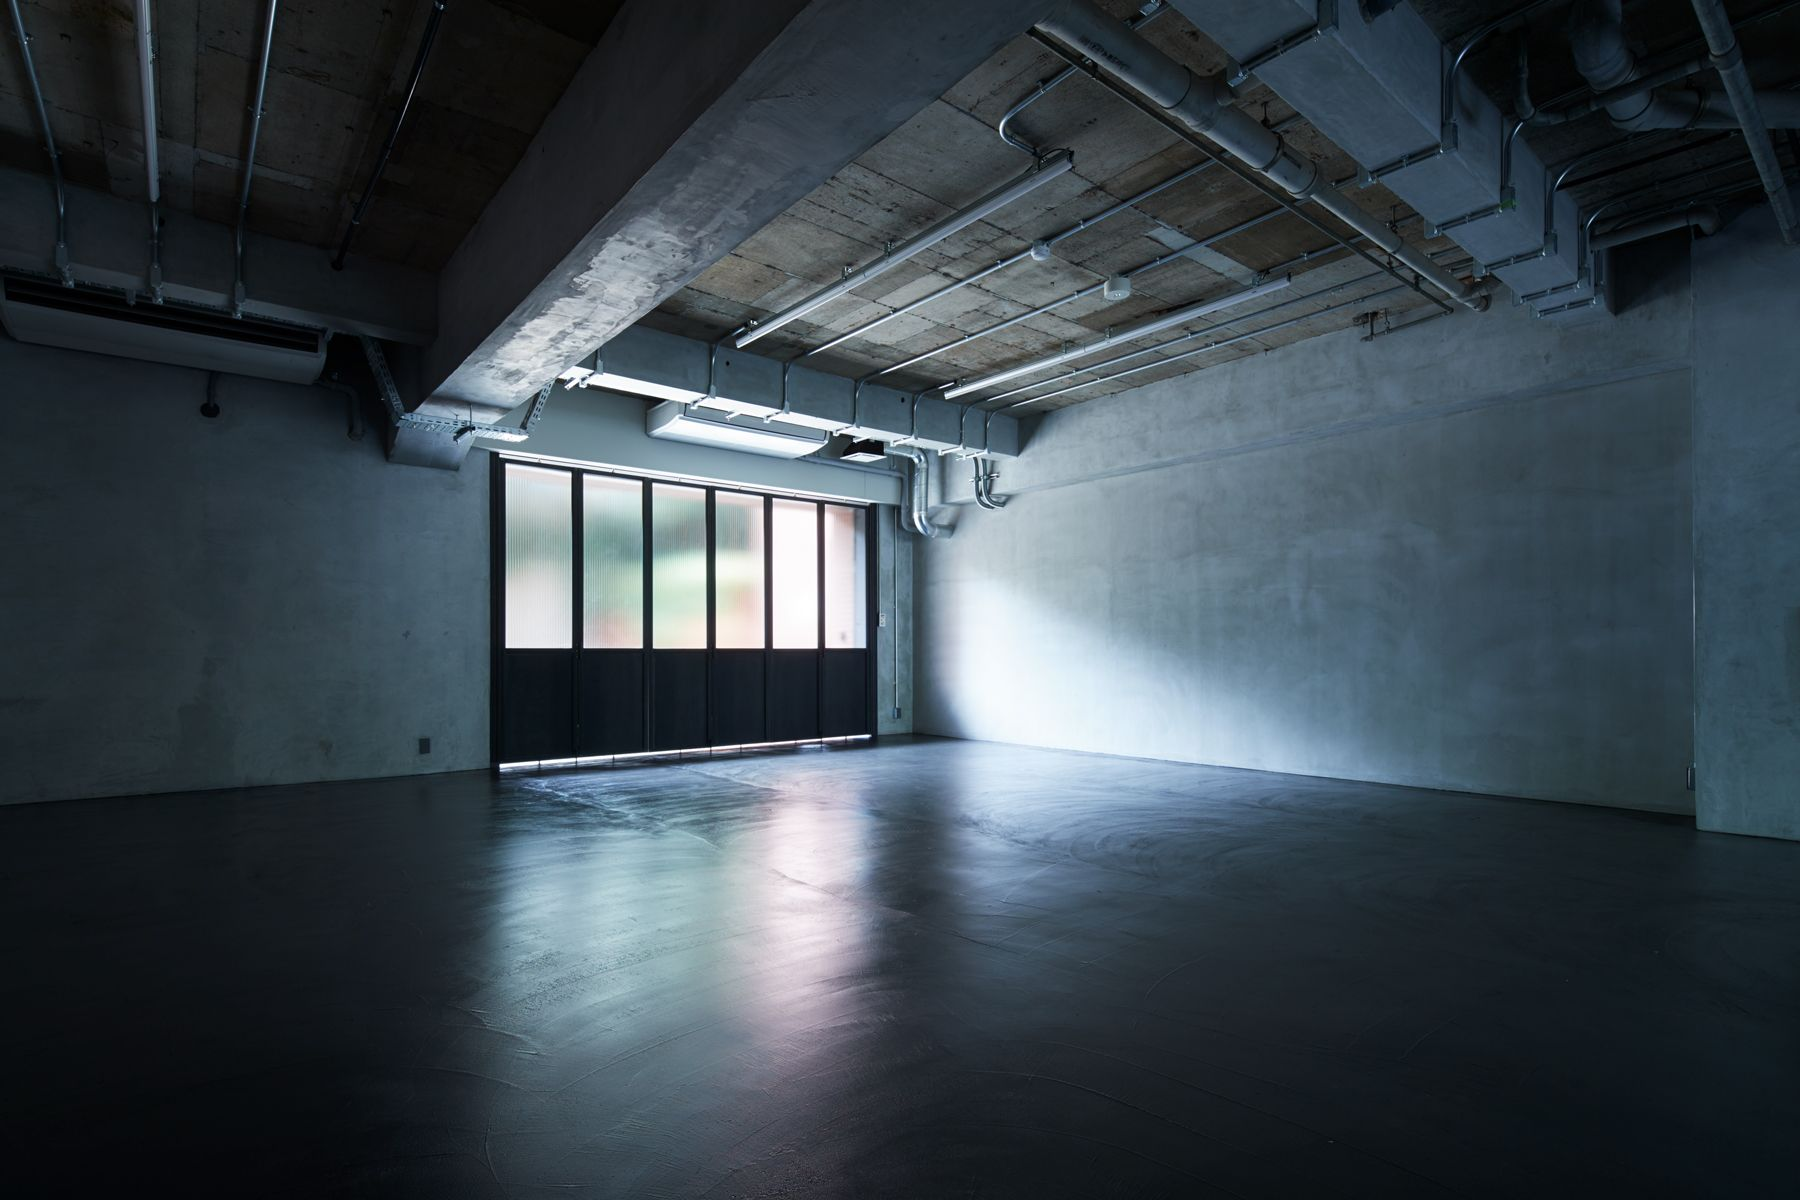 noru studio (ノル スタジオ)中庭から差し込む柔らかな光